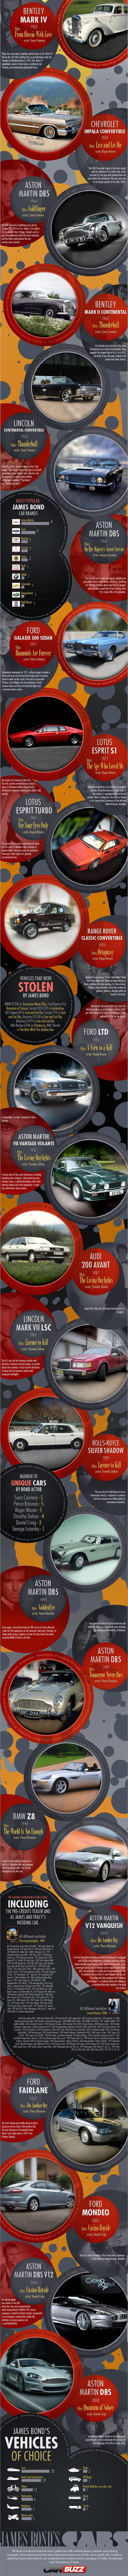 James Bond Vehicles-infographic